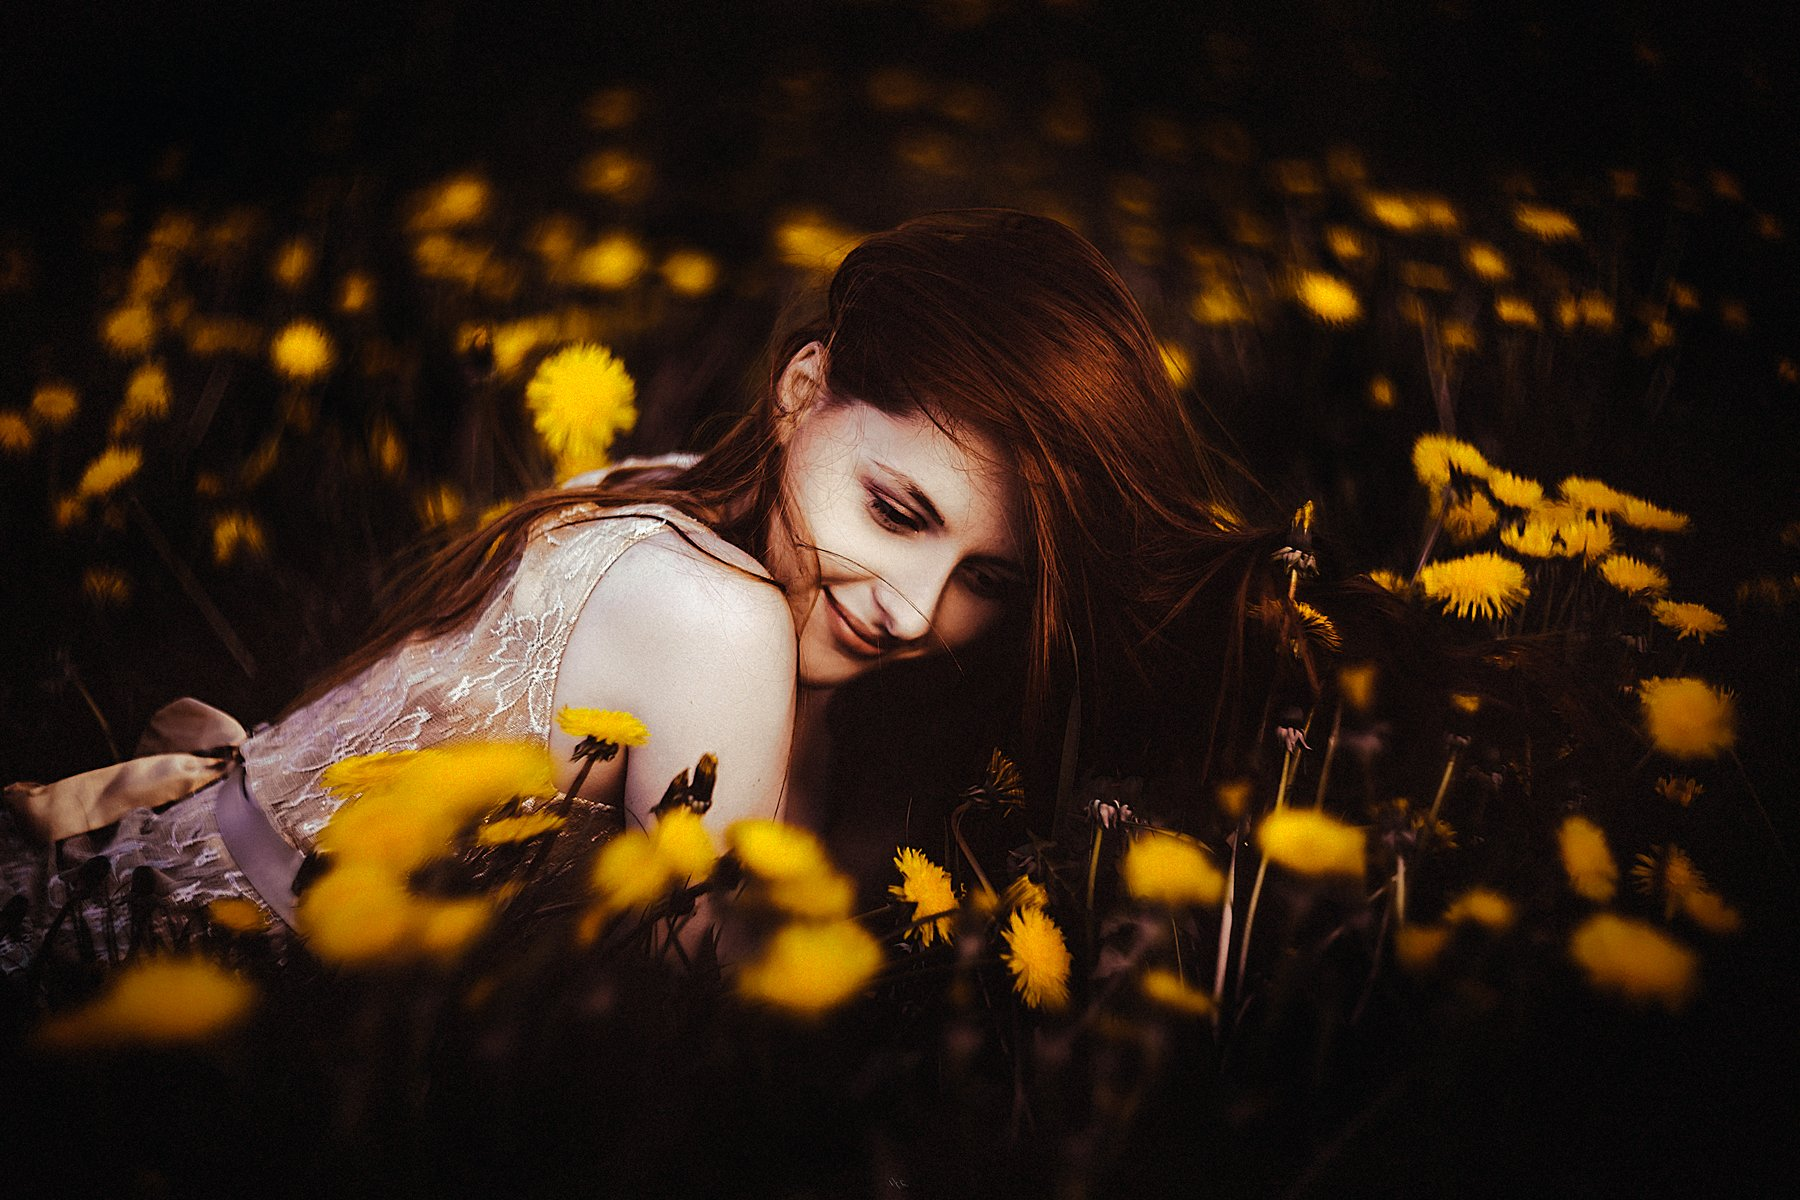 woman, portrait, dundelions, toning, beauty, Руслан Болгов (Axe)